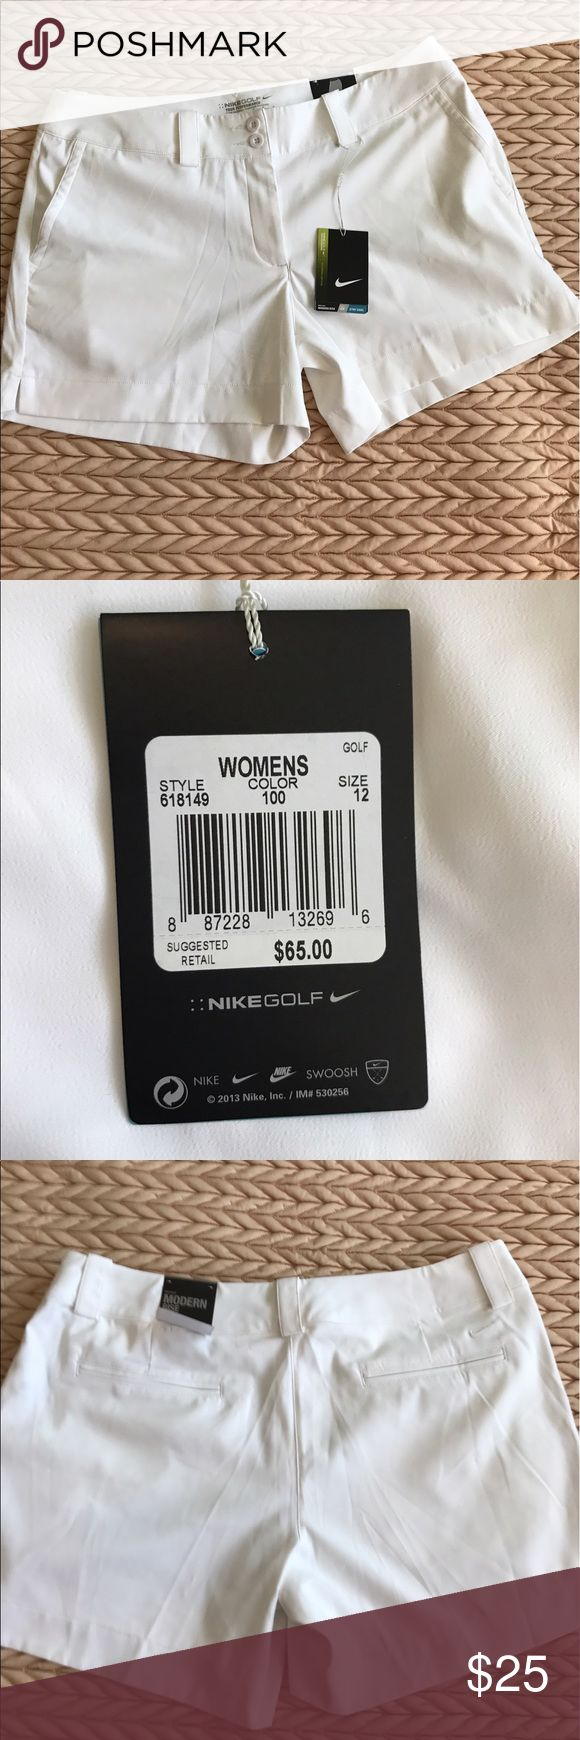 "Women's Nike Golf Shorts White Nike women's golf shorts size 12. 13 1/2"" waist to hem. Nike Shorts"